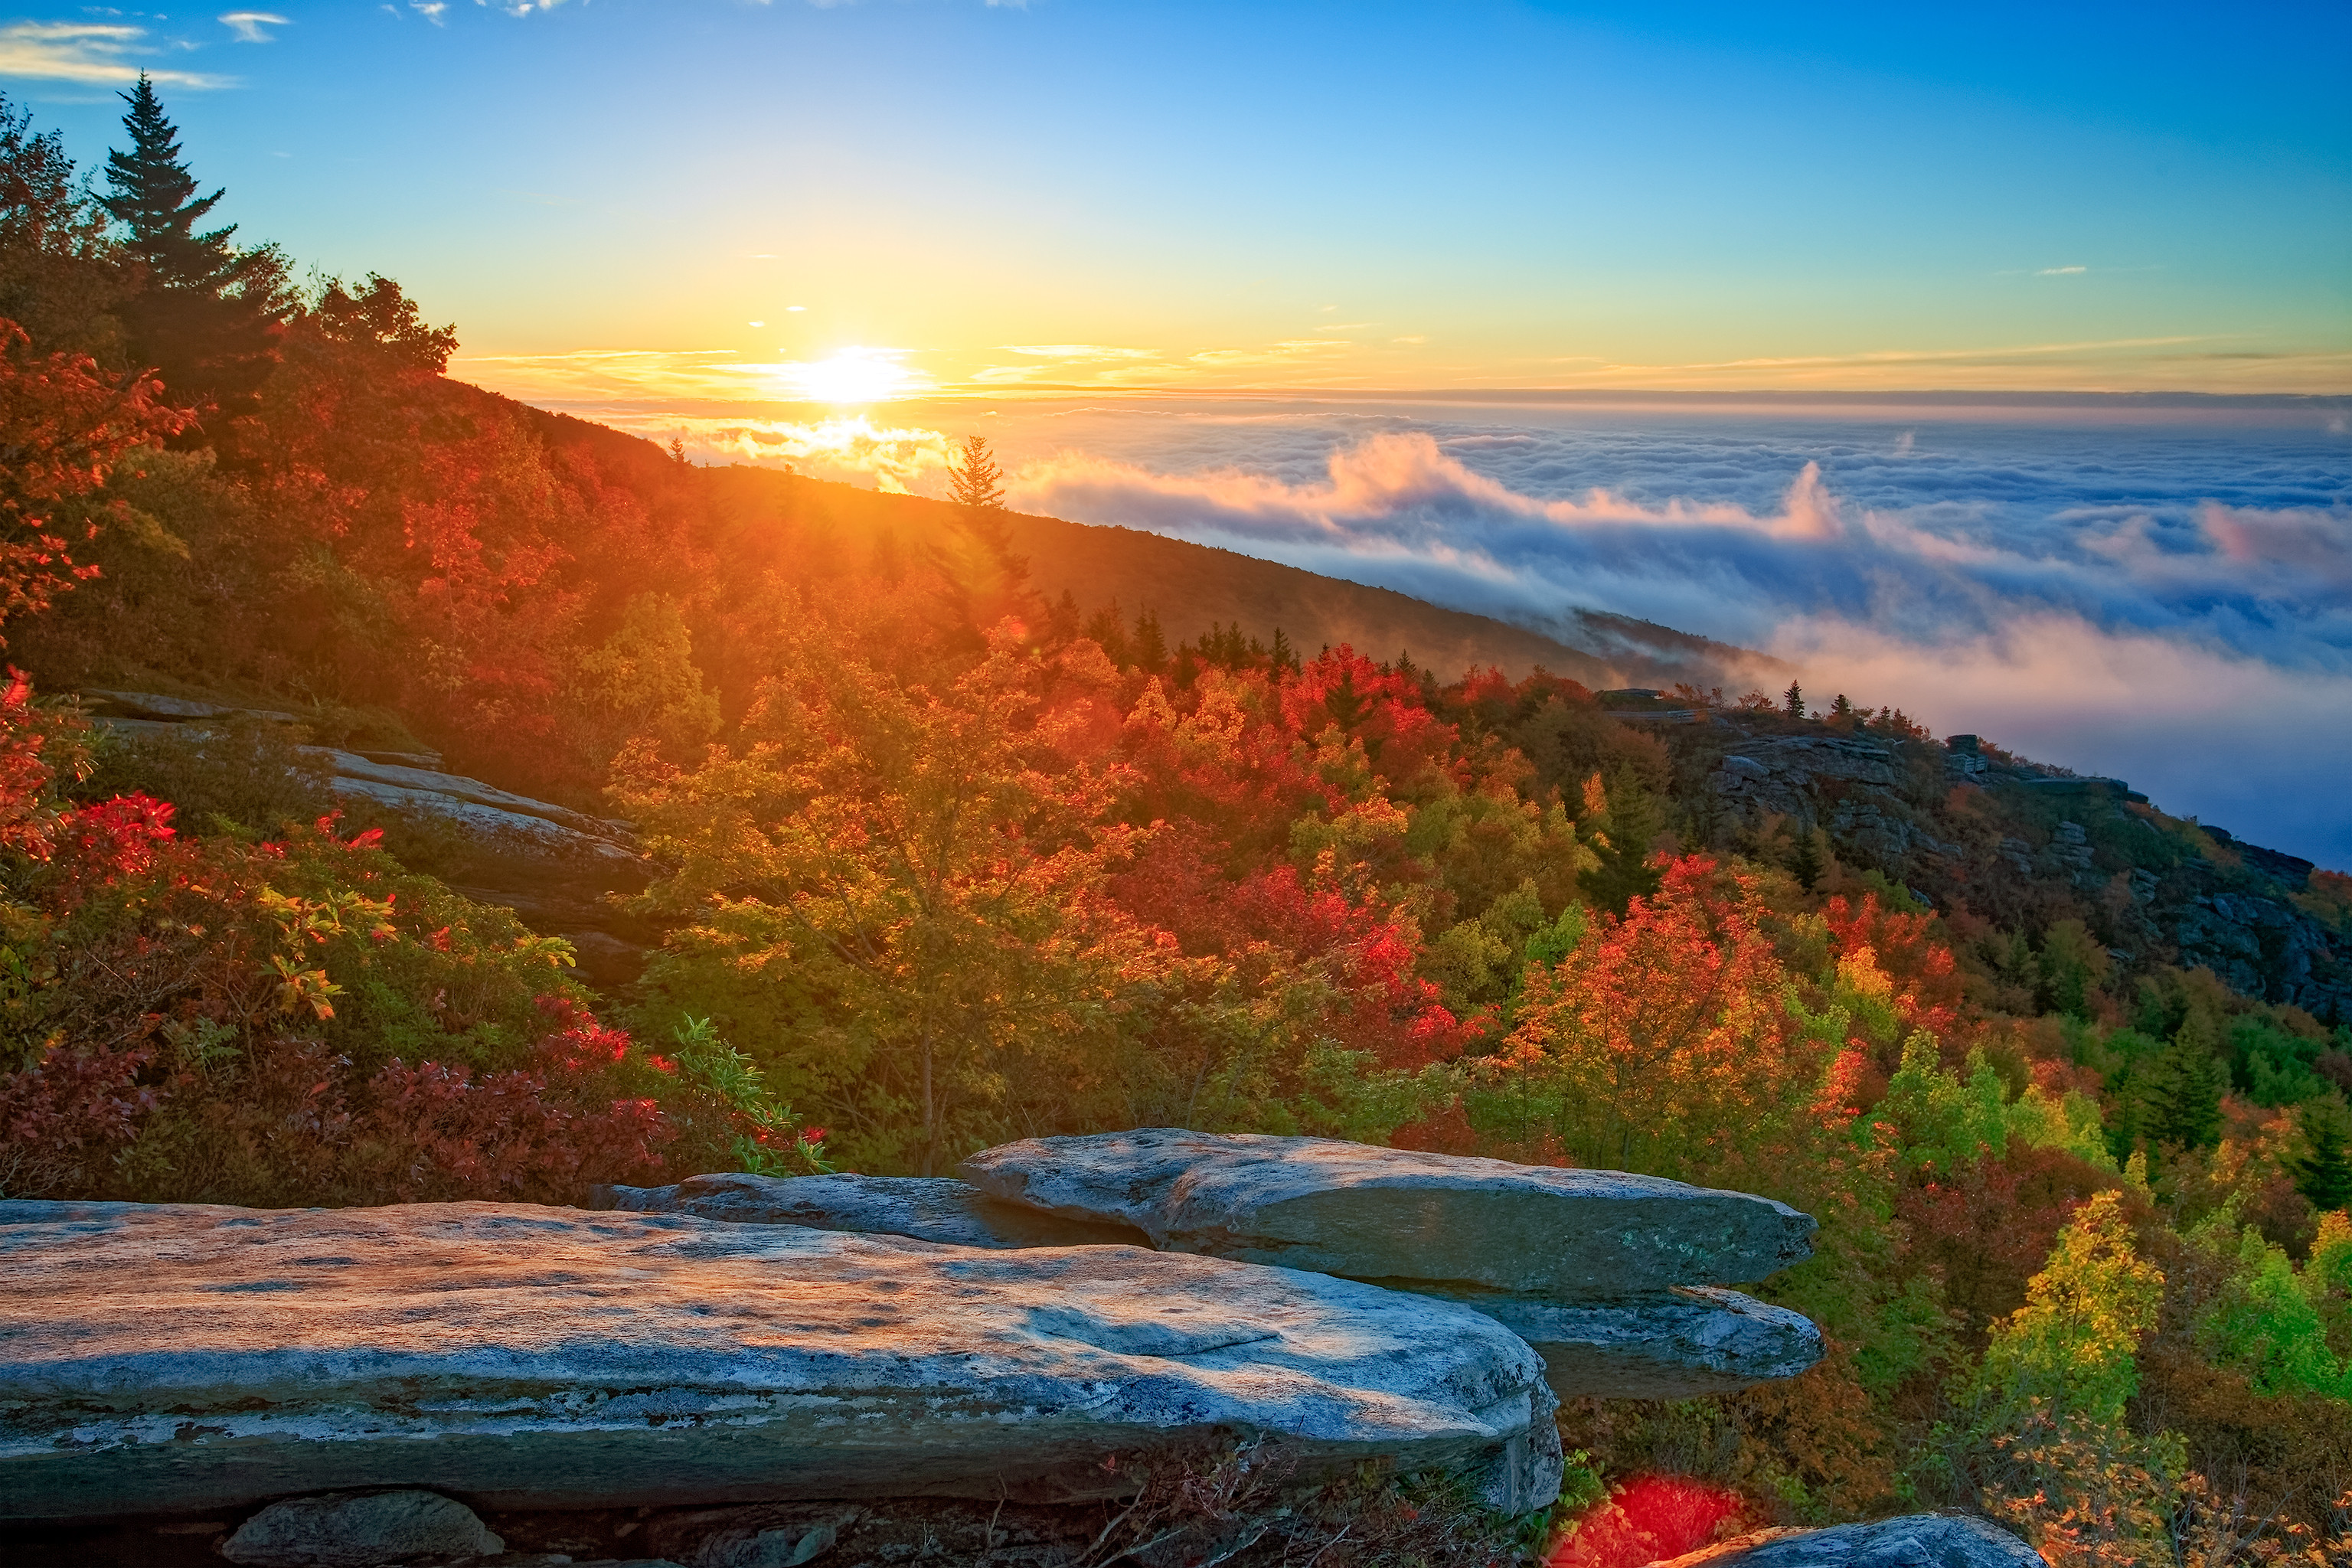 обои Северная Каролина, горы, закат, облака картинки фото